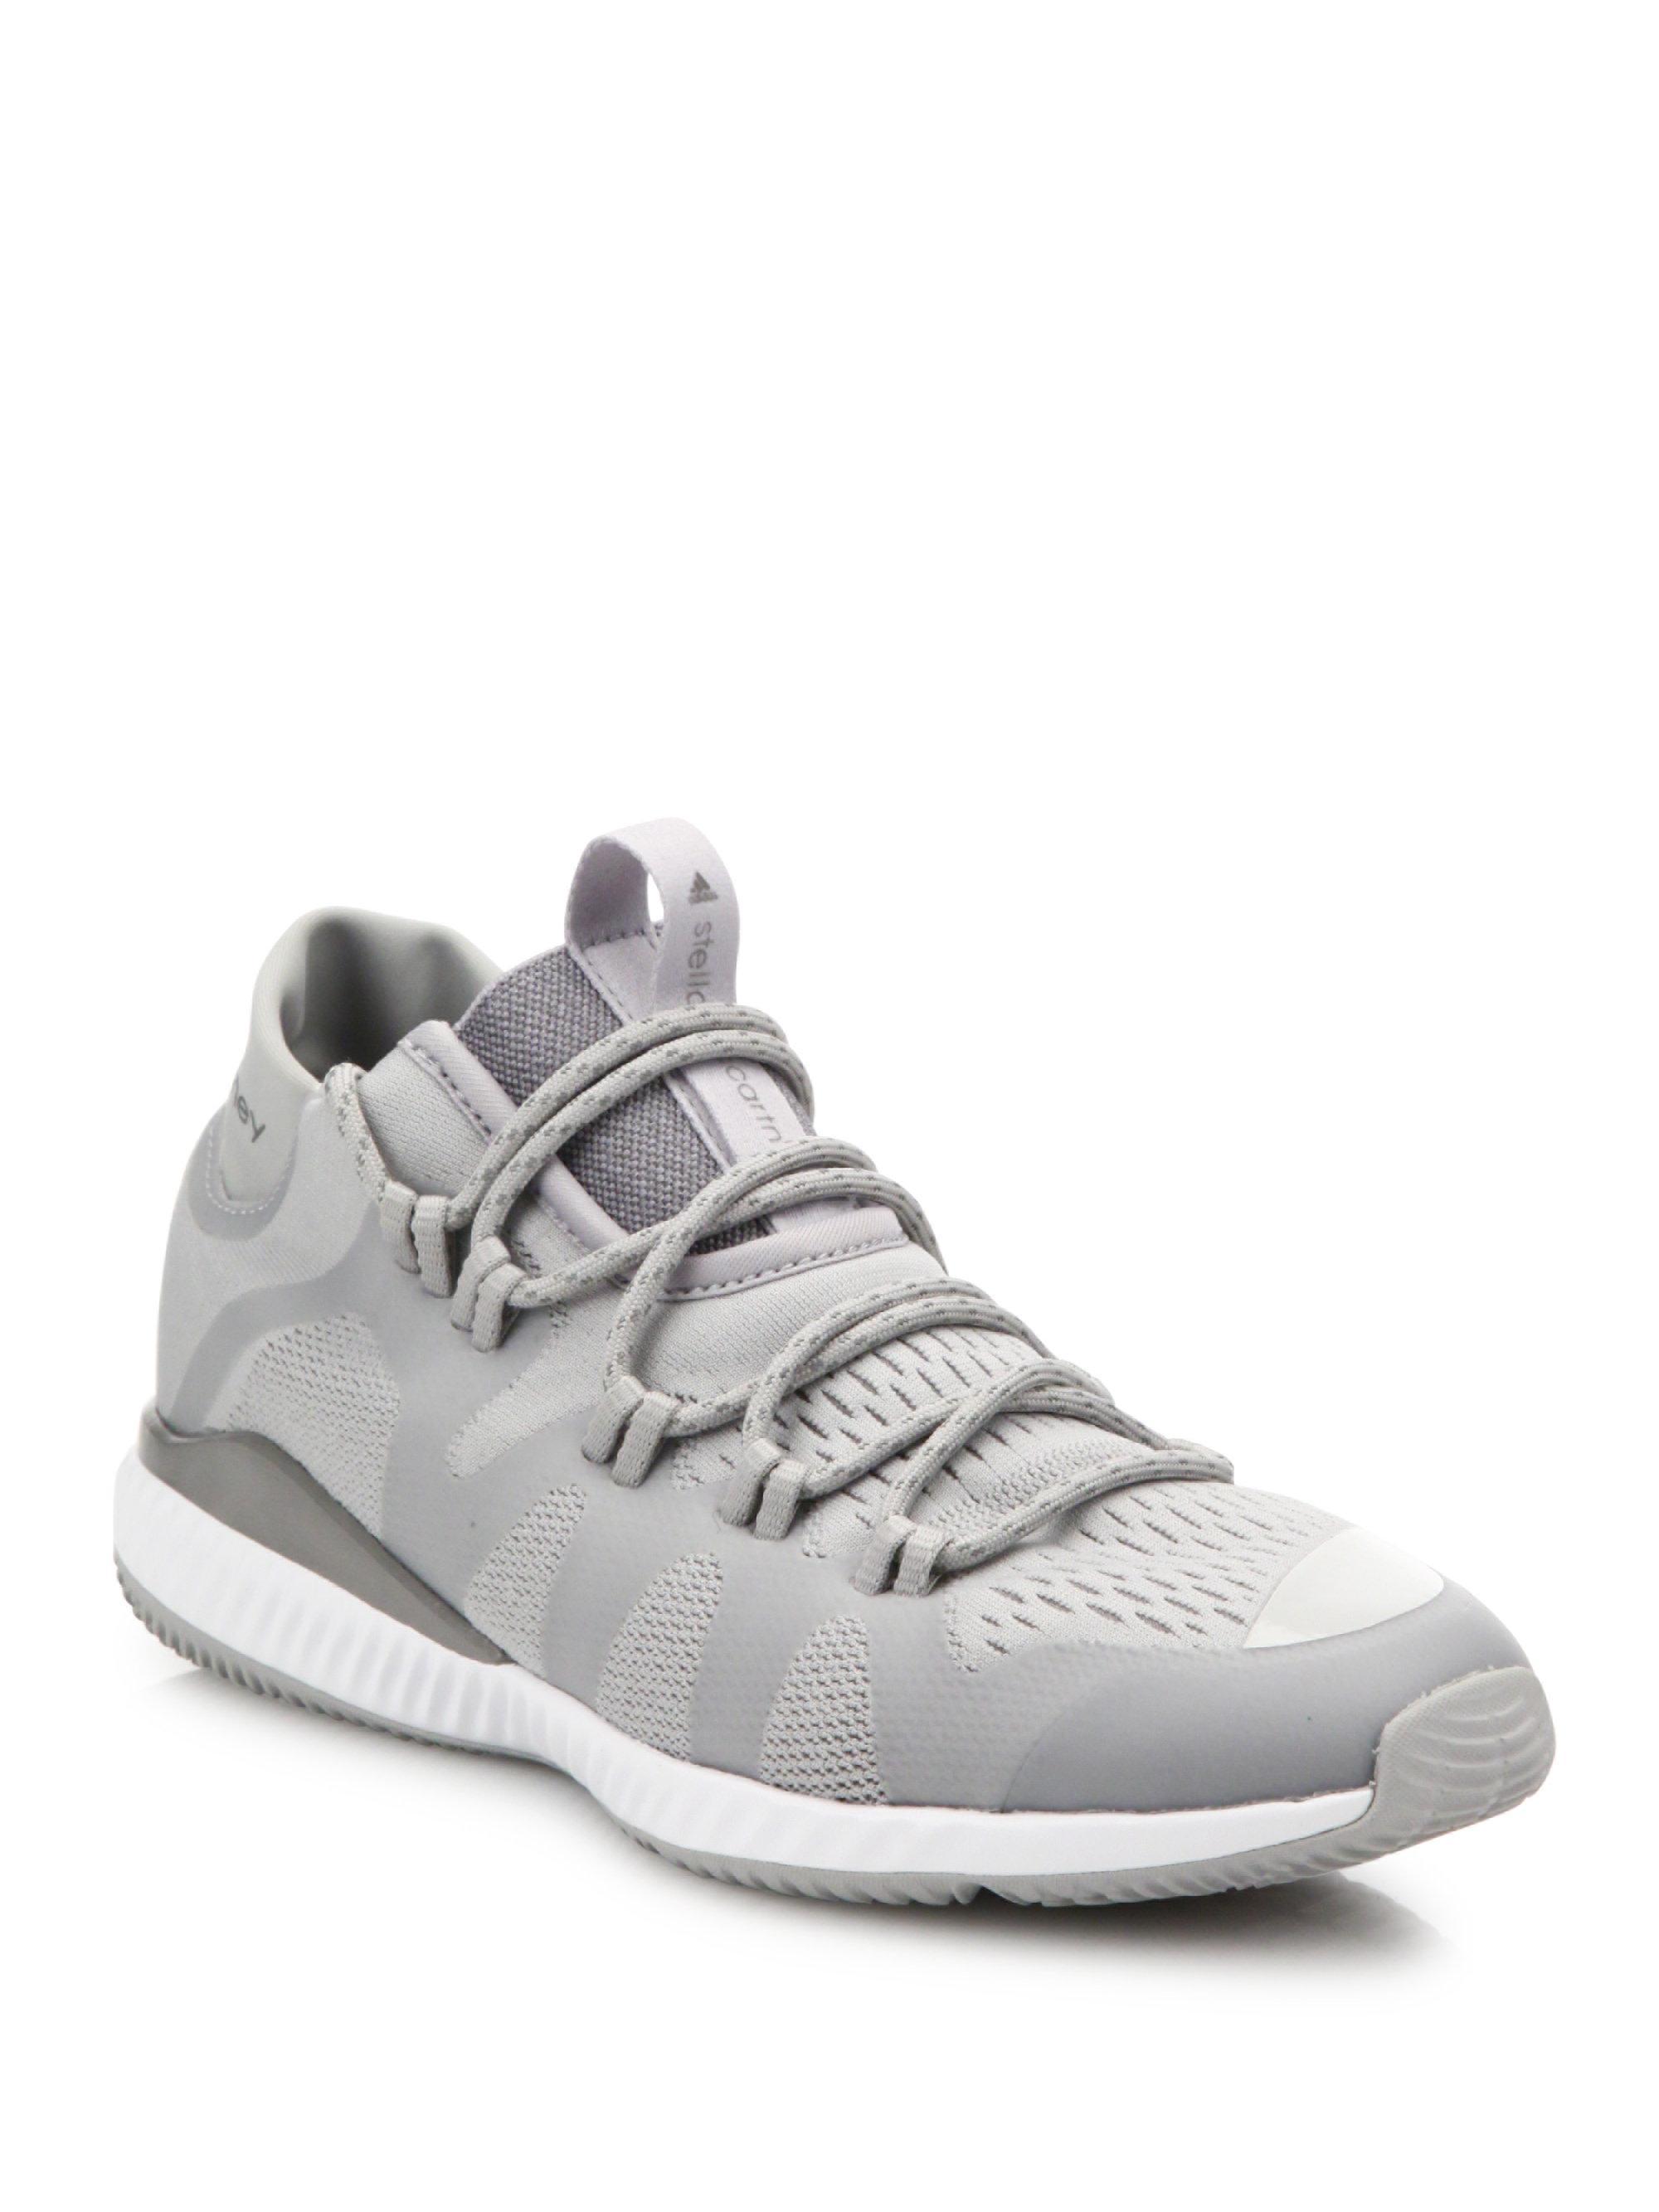 Adidas Par Stella Mccartney Crazytrain Rebond - Milieu Bas-tops Et Chaussures De Sport PJ5anx